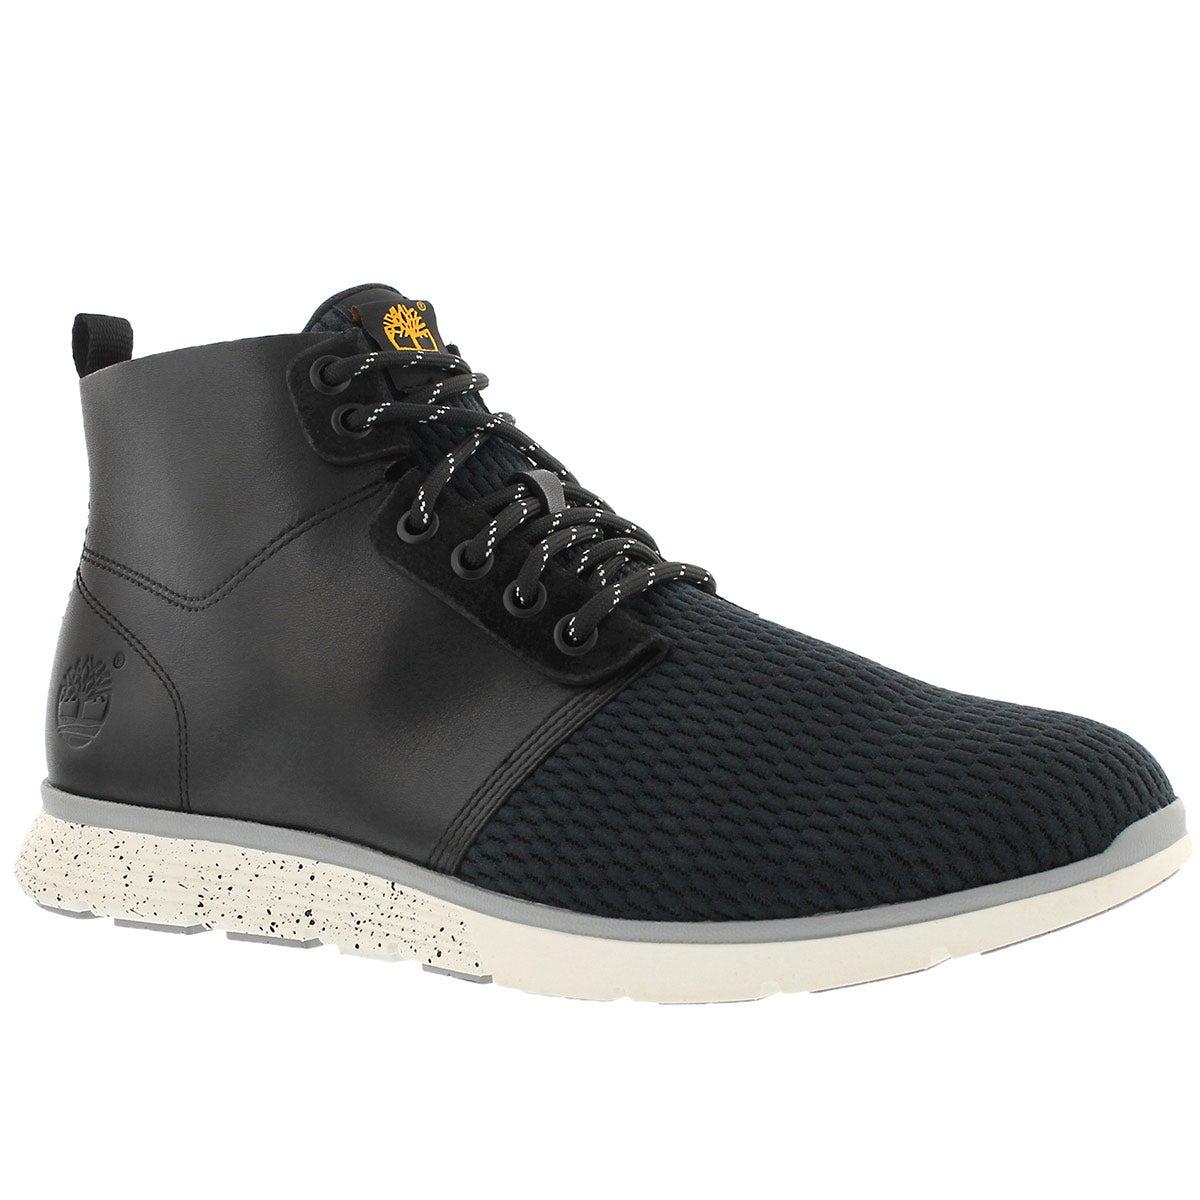 Men's KILLINGTON black chukka boots